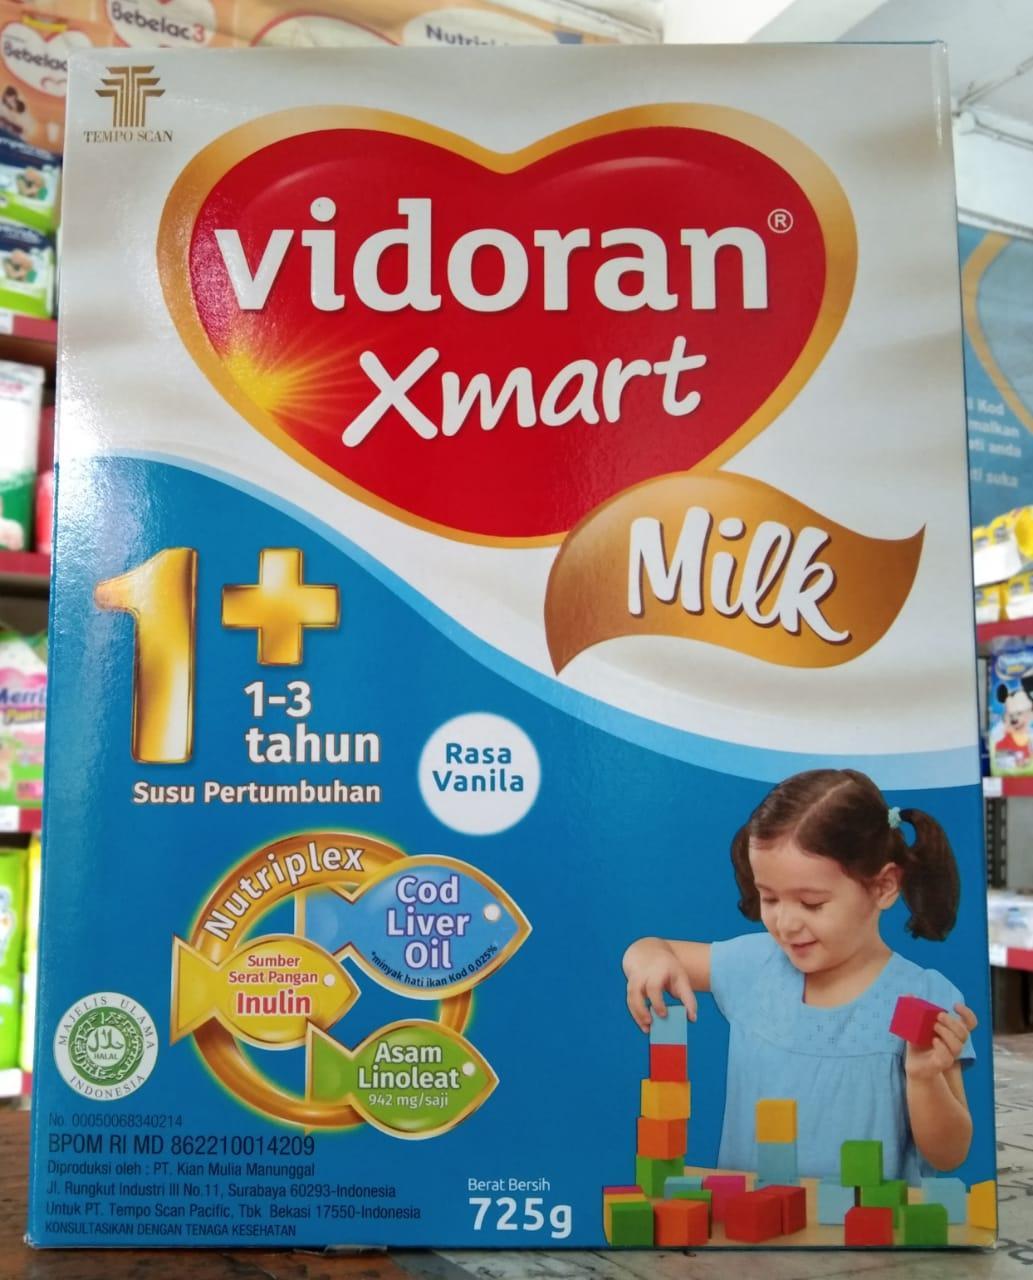 Susu Vidoran Xmart 1+. Vanila. 725 Gram. Usia 1-3 Tahun